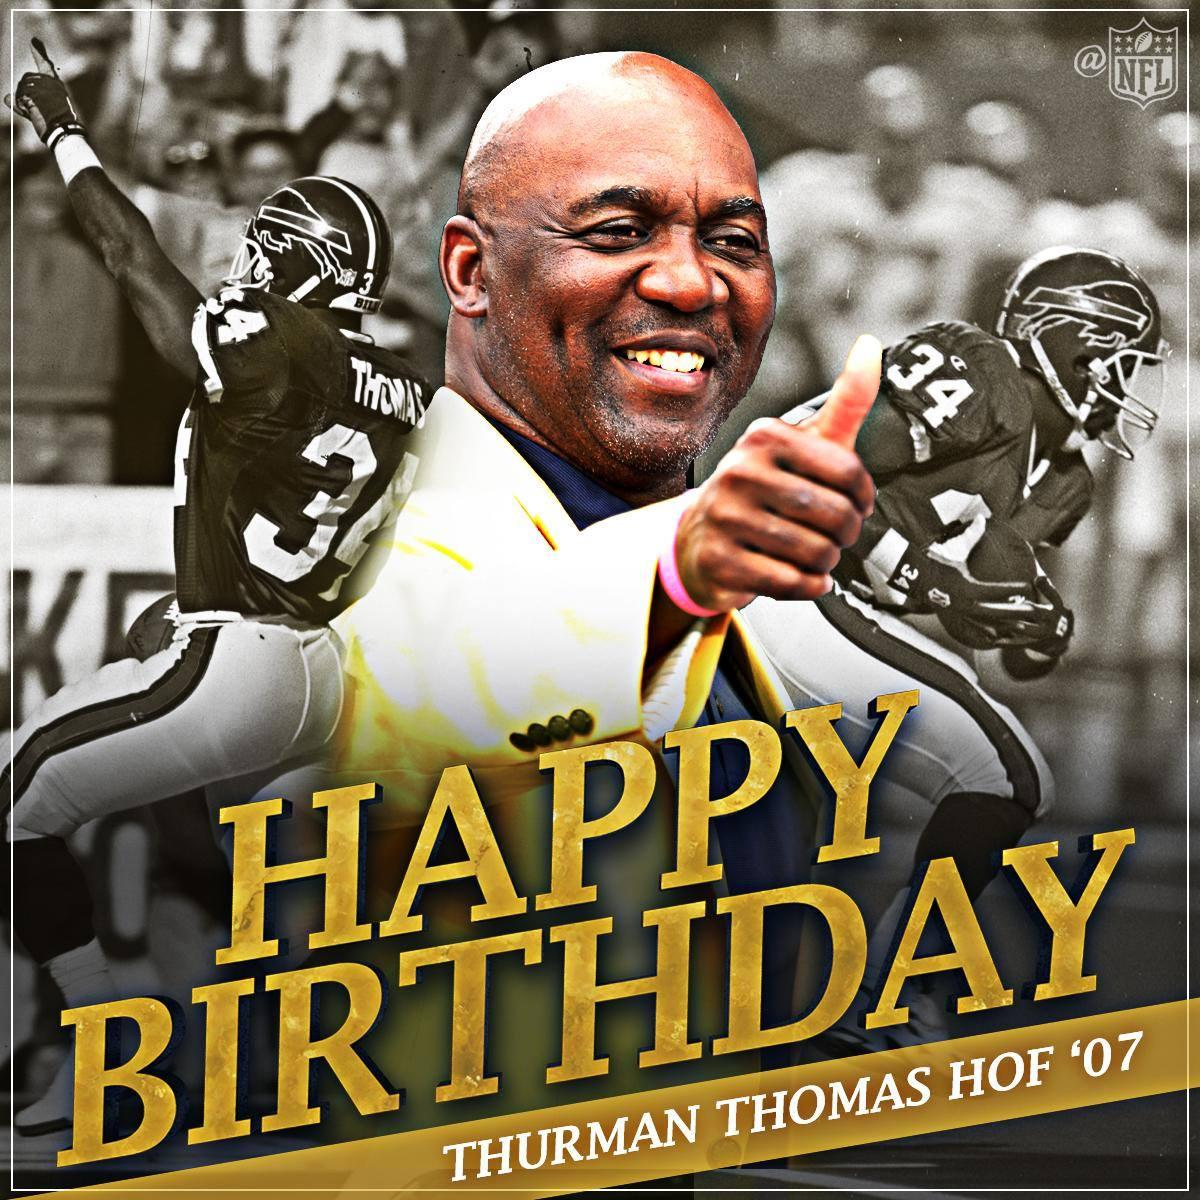 Over 12,000 career rushing yards. And a @ProFootballHOF Golden Jacket.  Happy birthday to @buffalobills legend @thurmanthomas! <br>http://pic.twitter.com/NOvs9kcq4y